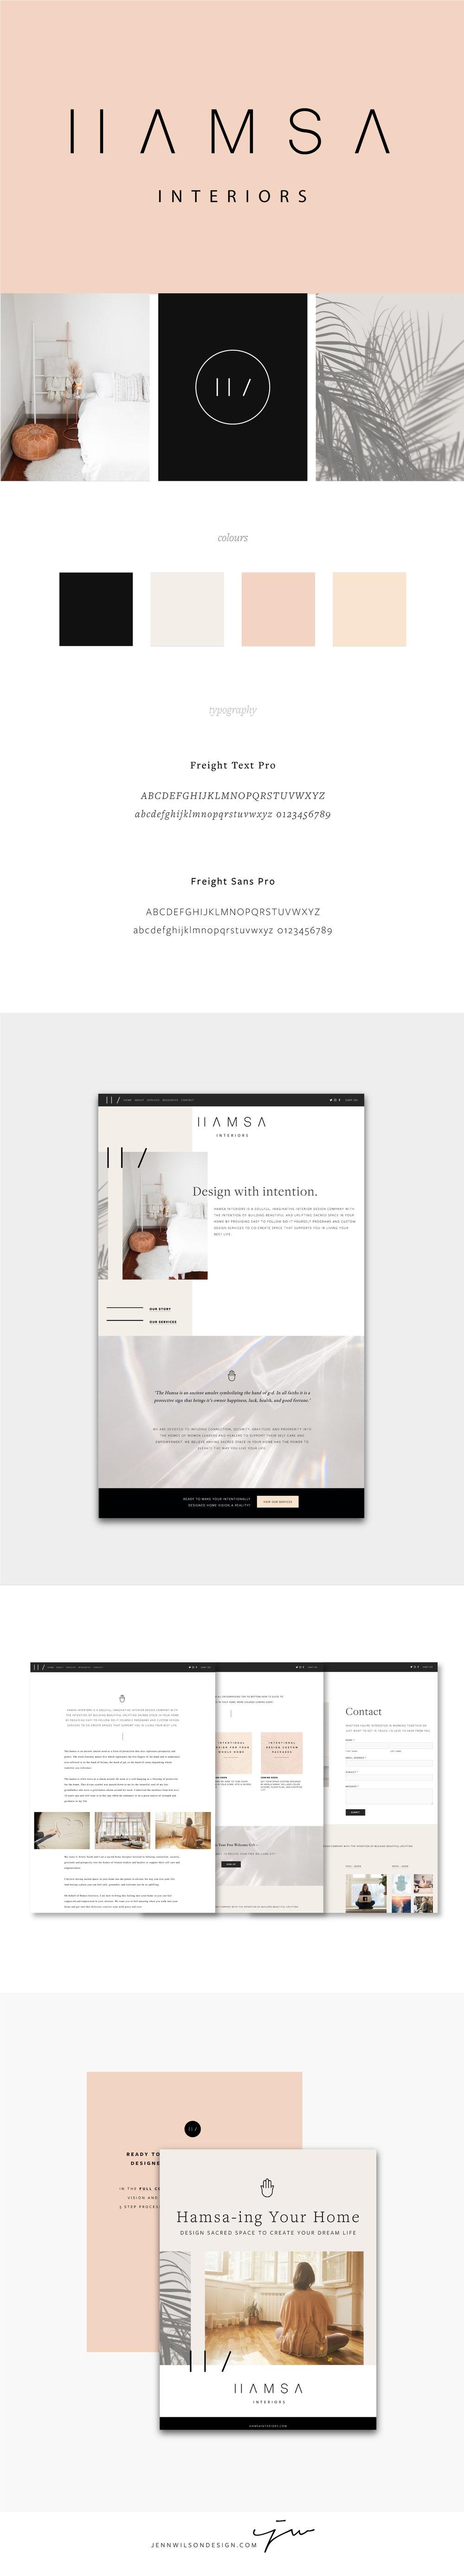 Hamsa-Interiors--jenn-wilson-design